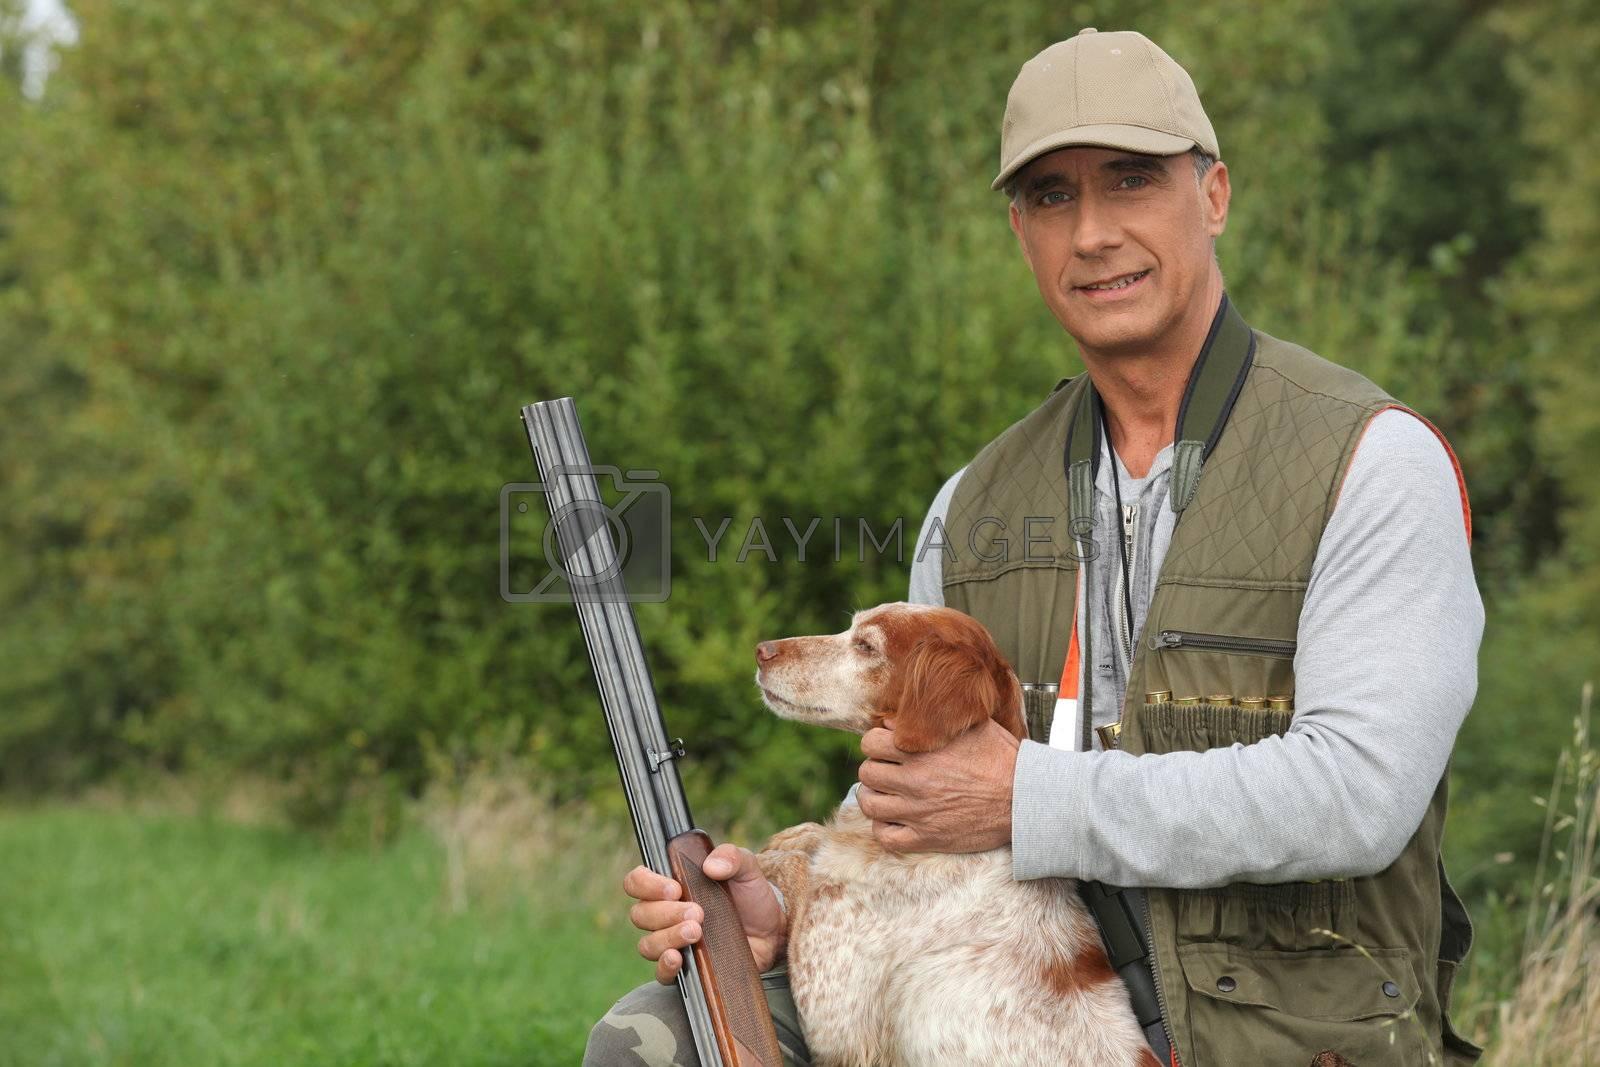 Hunter crouching by dog